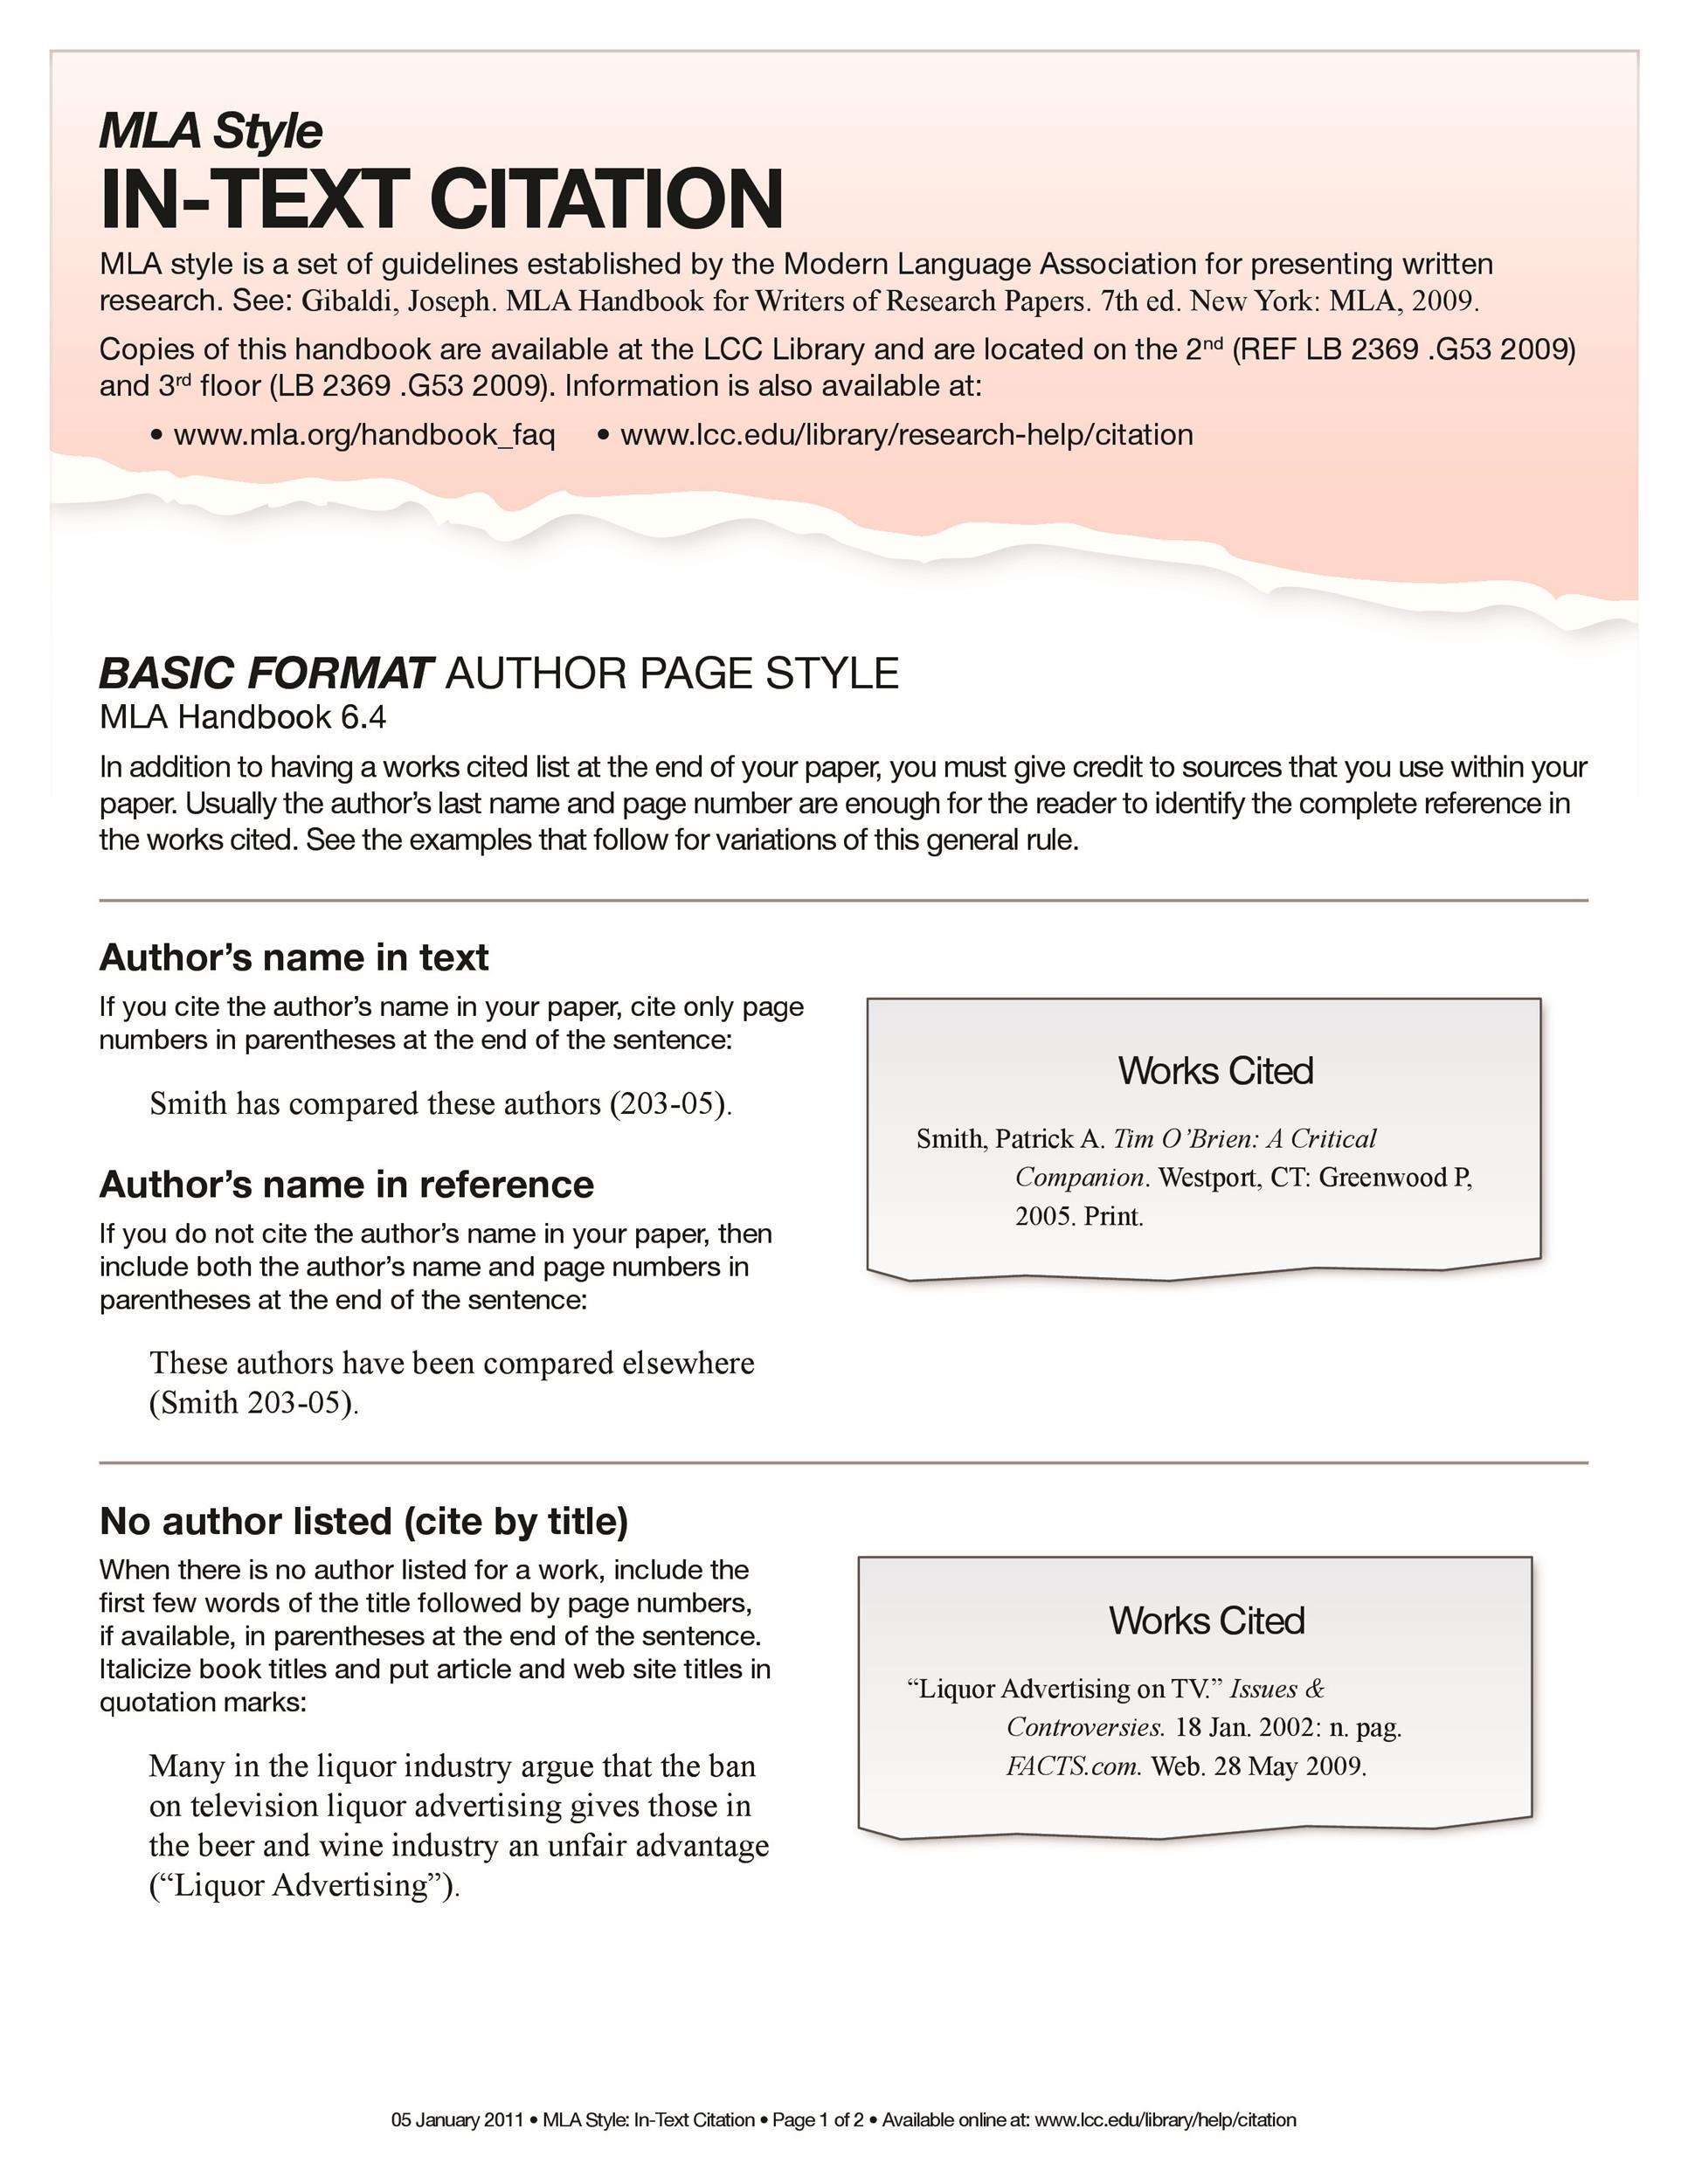 38 Free Mla Format Templates Mla Essay Format Templatelab